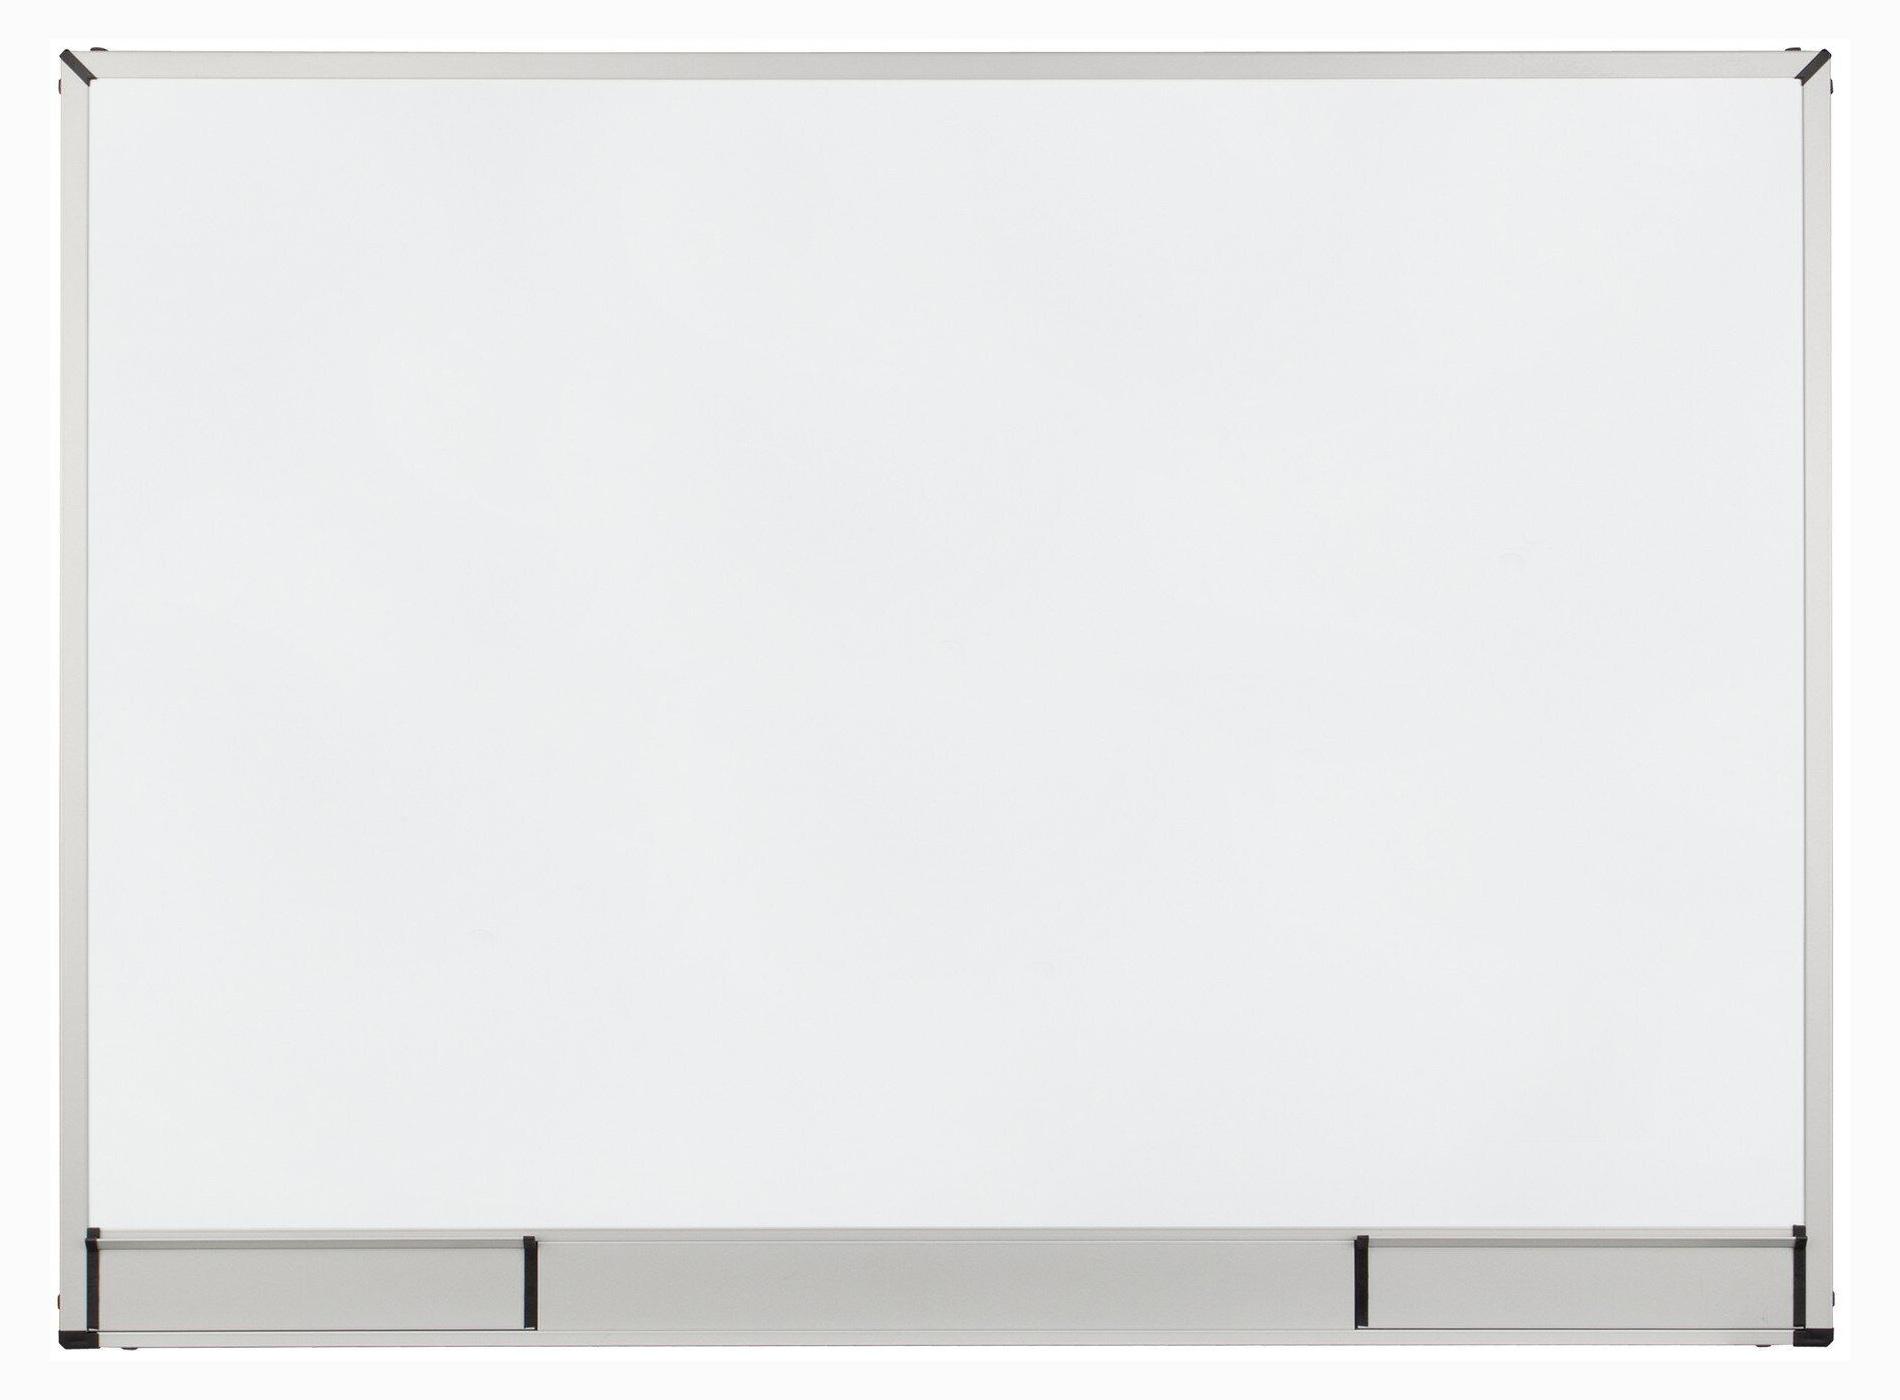 Доска белая магнитная сухостираемая StarBoard 100*150см., алюминиевая рамка, керамика 2x3 - фото 8